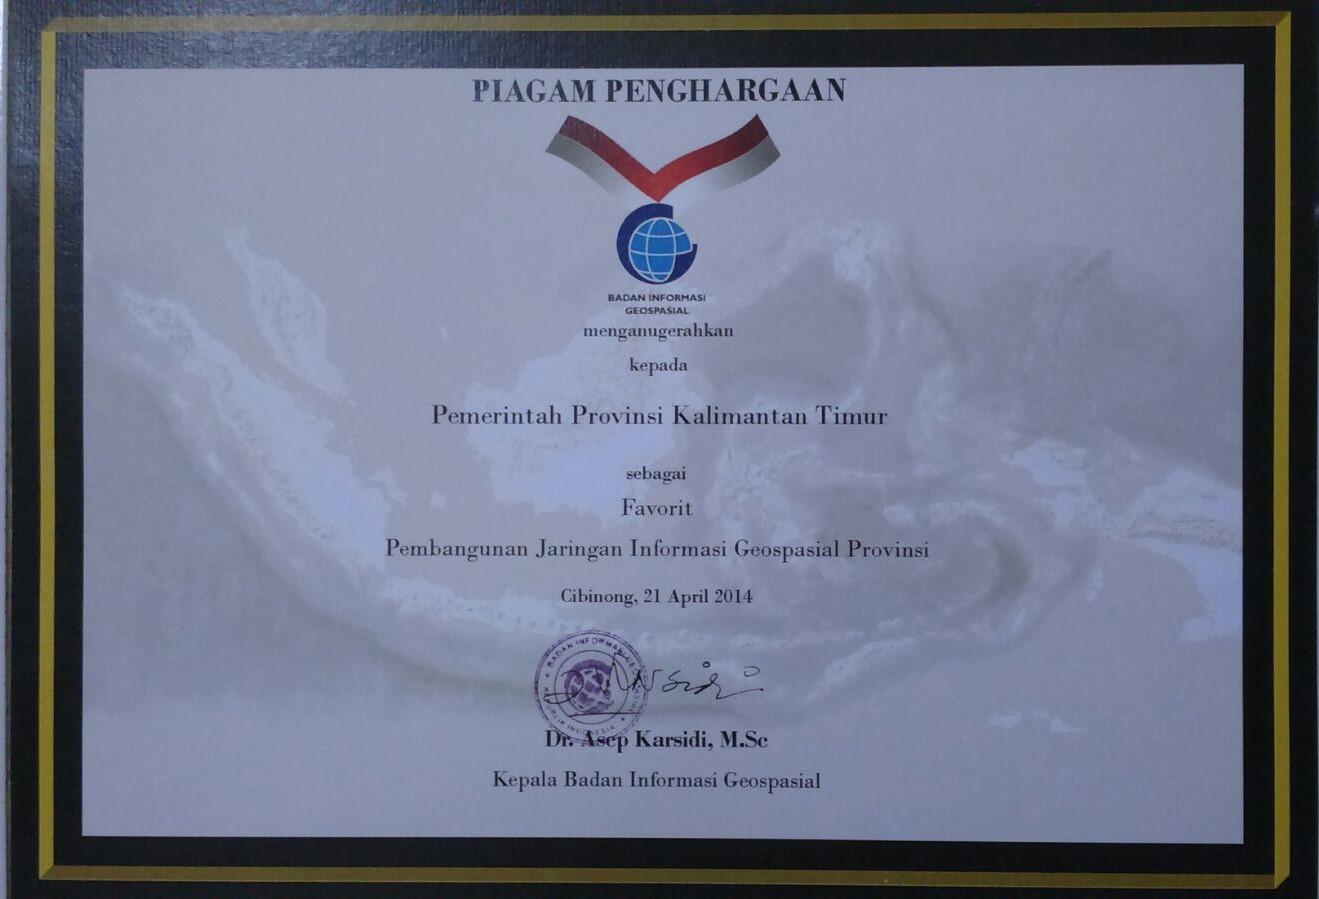 Penghargaan Badan Informasi Geospasial kpd Pemprov Kaltim sbg Favorit Pemb. Jaringan Informasi Geospasial Provinsi Tahun 2014